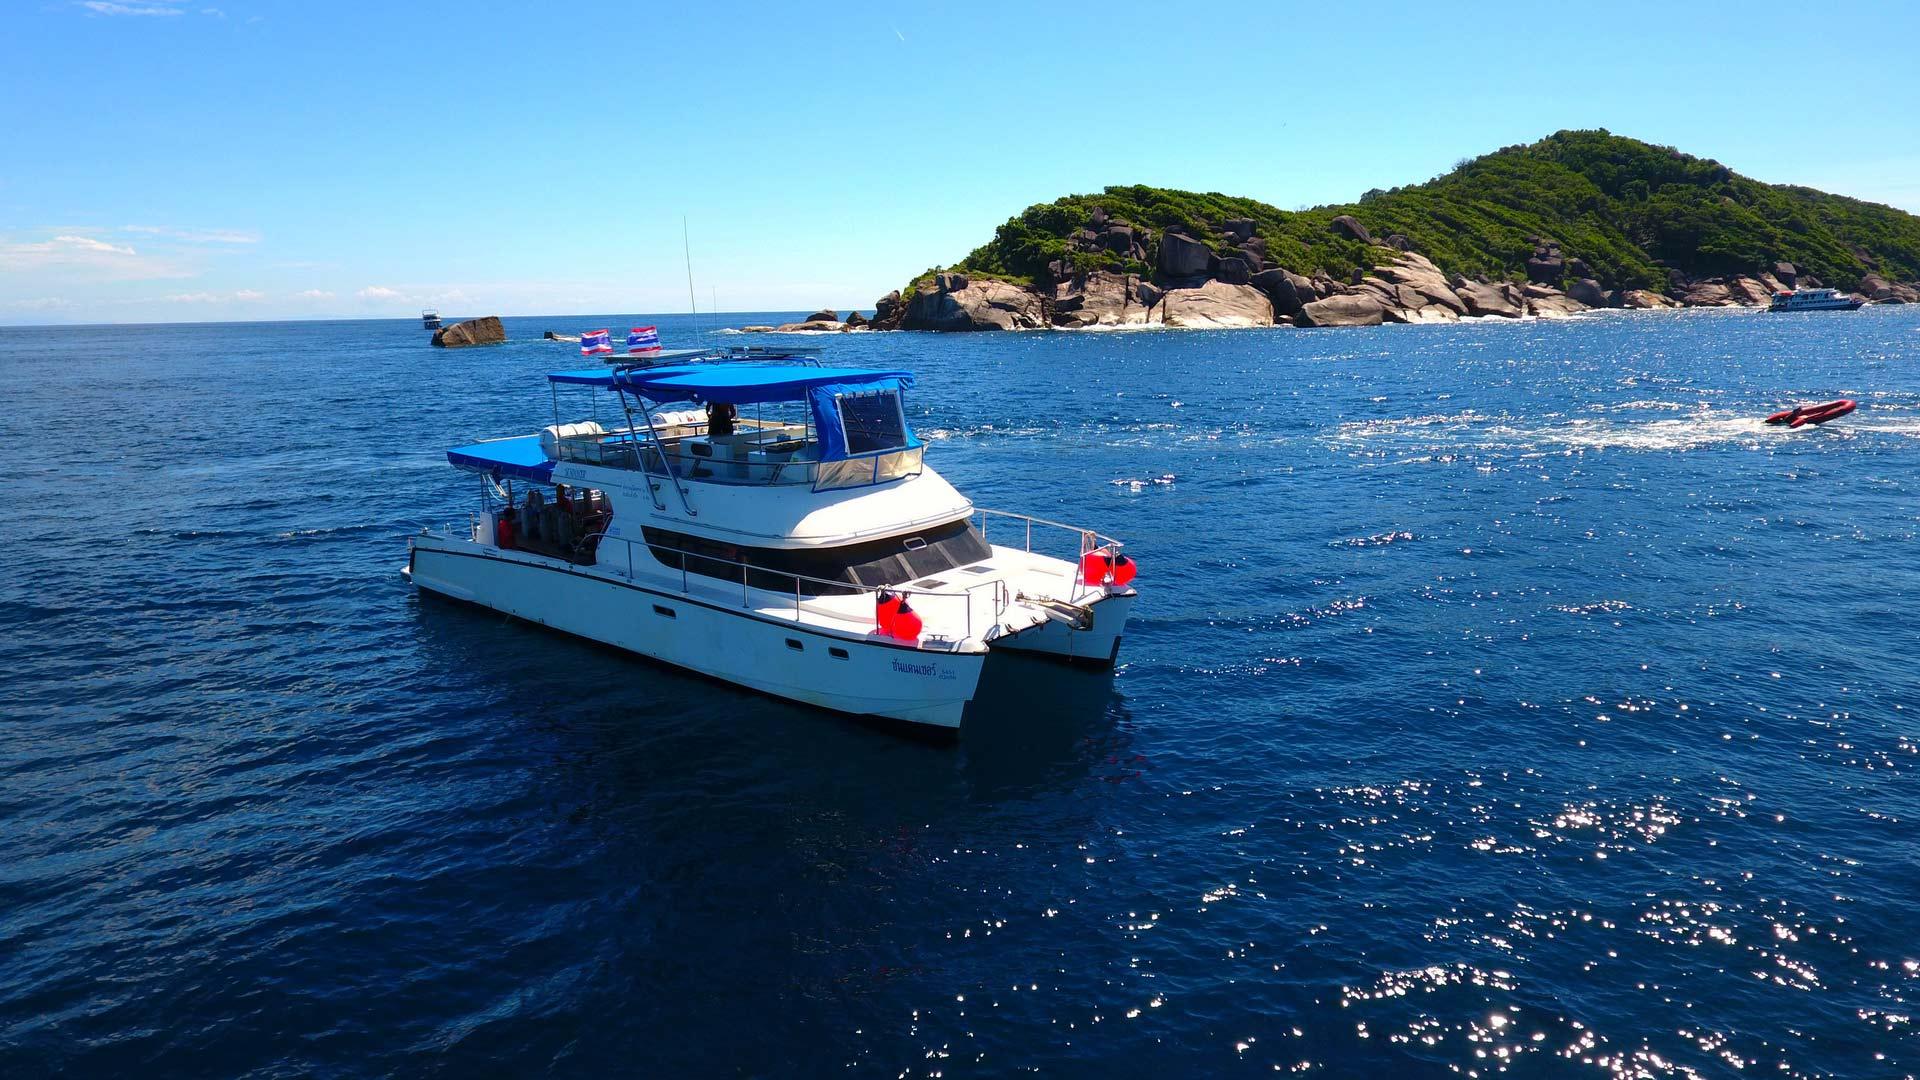 Similan islands diving daytrip on the MV Sundancer